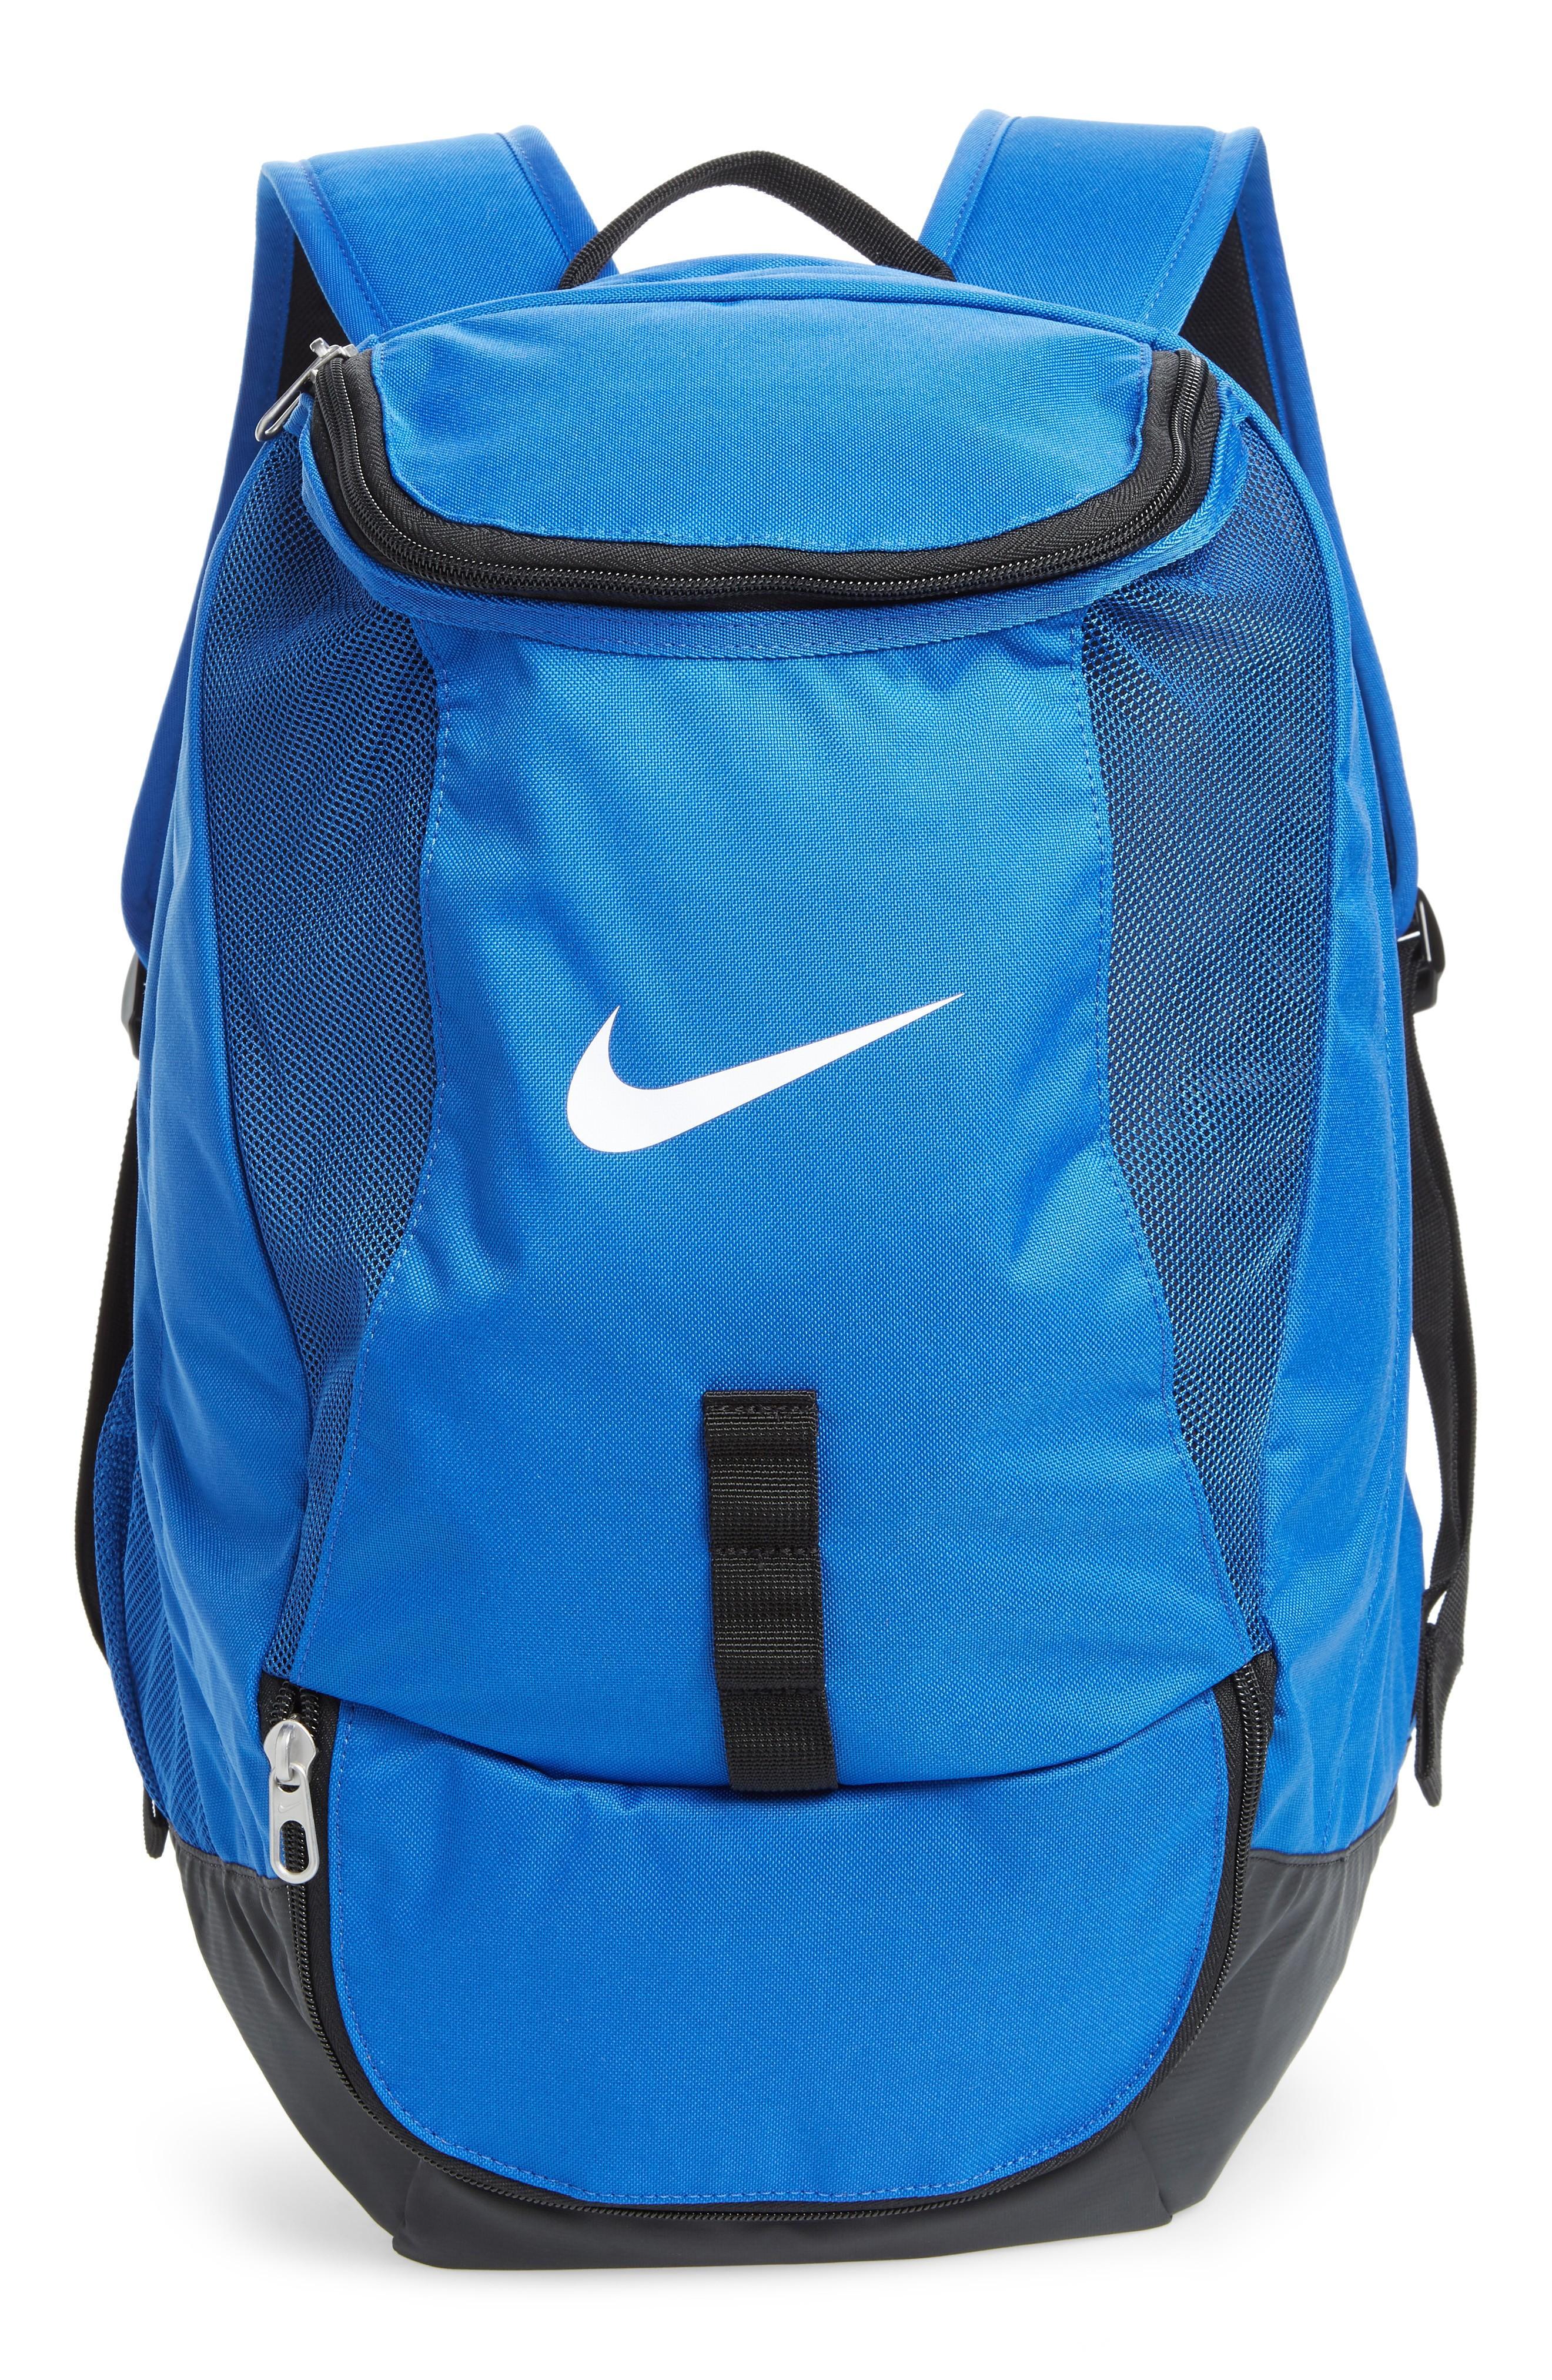 Nike Club Team Backpack - Blue In Varsity Royal/ Black/ White